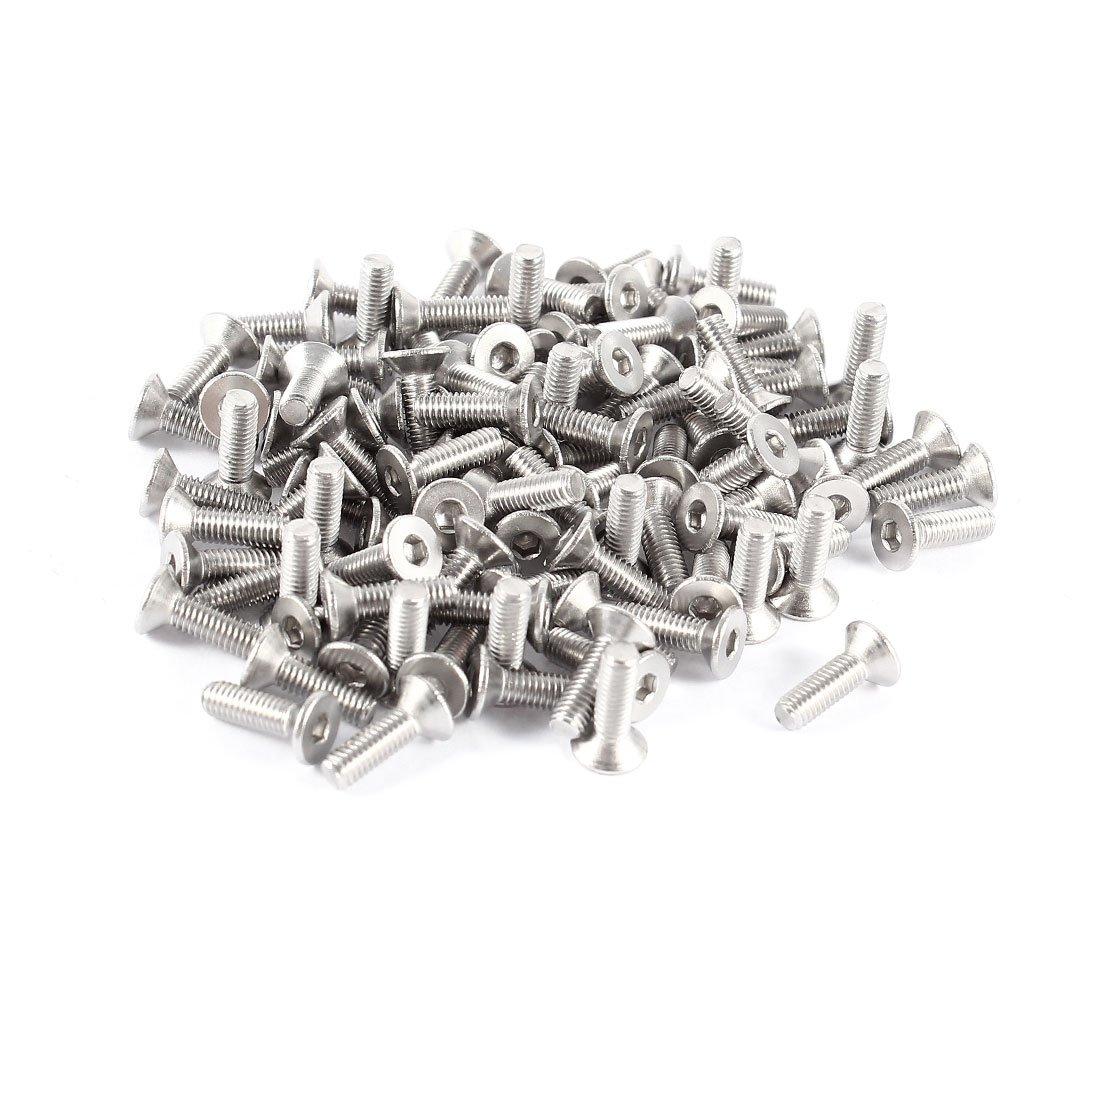 sourcingmap® 100 Pcs 304HC Stainless Steel Countersunk Flat Head Bolt Screw M3x10mm a14051300ux0158